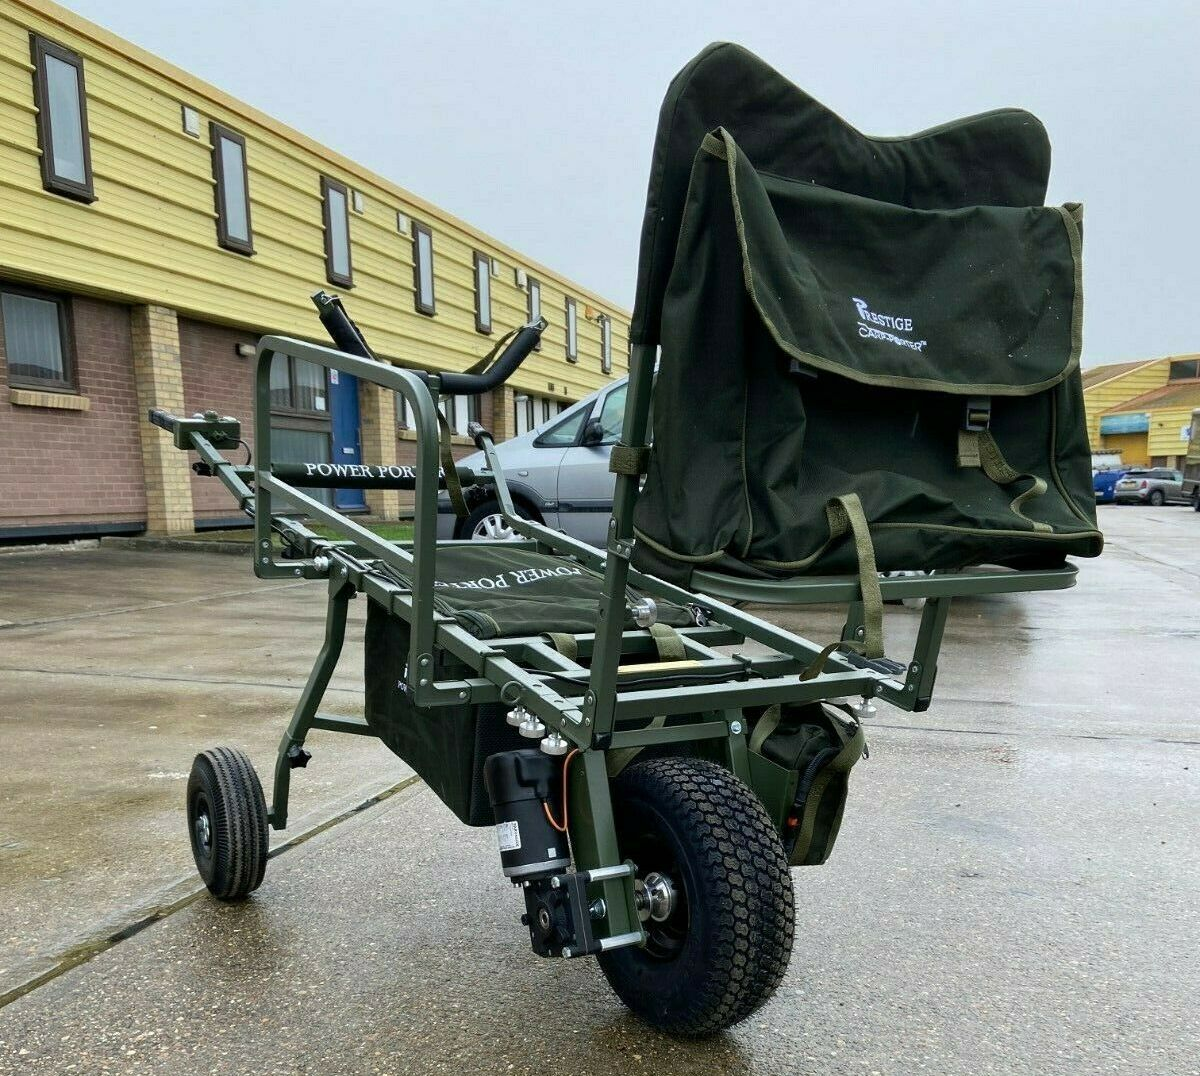 Ad - Carp Porter POWER PORTER 24V EVO MK7 On eBay here -->> https://t.co/KJiPoXvudq  #carpfish